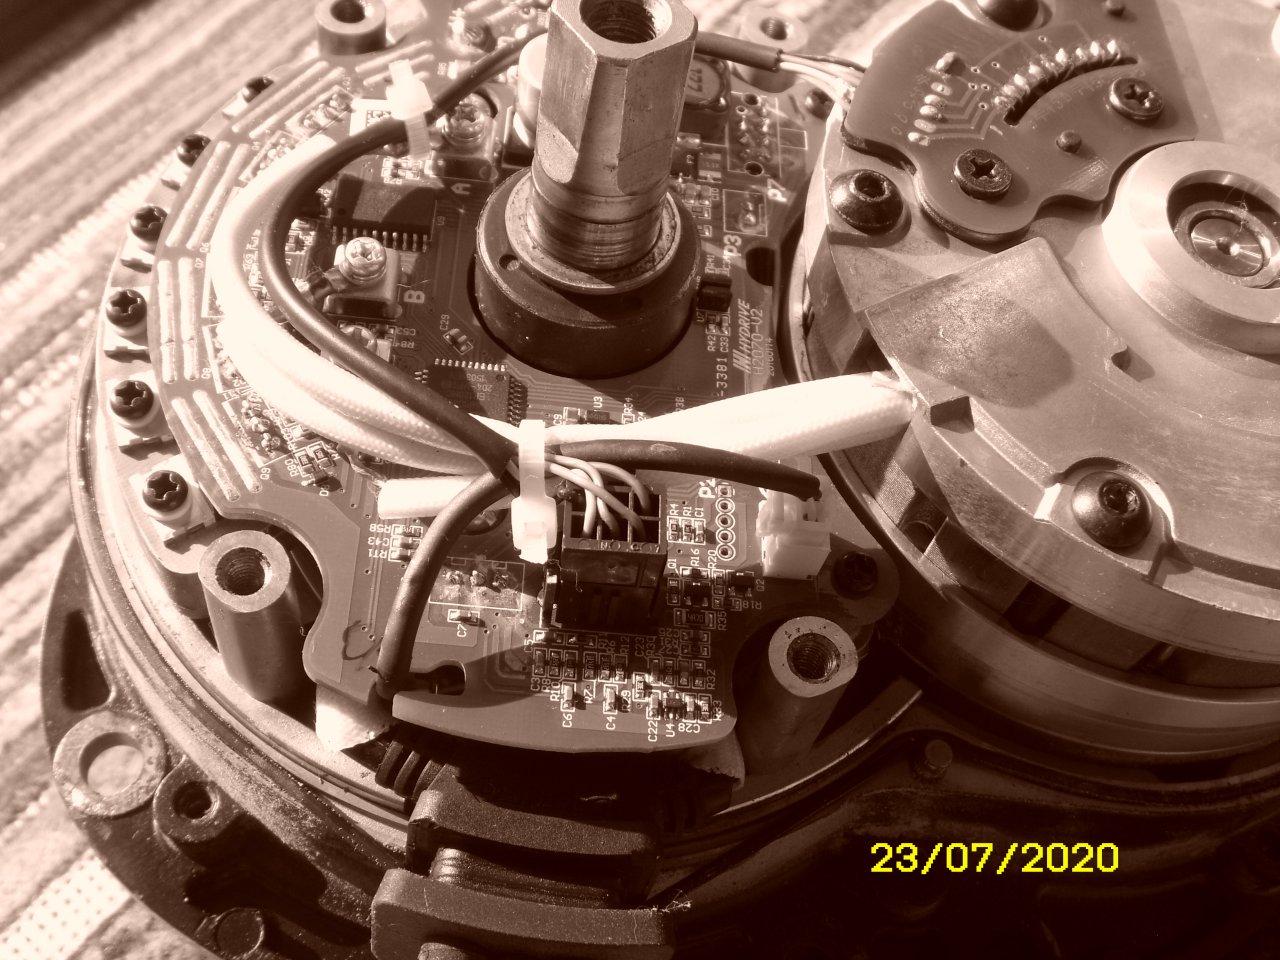 ST832519.JPG